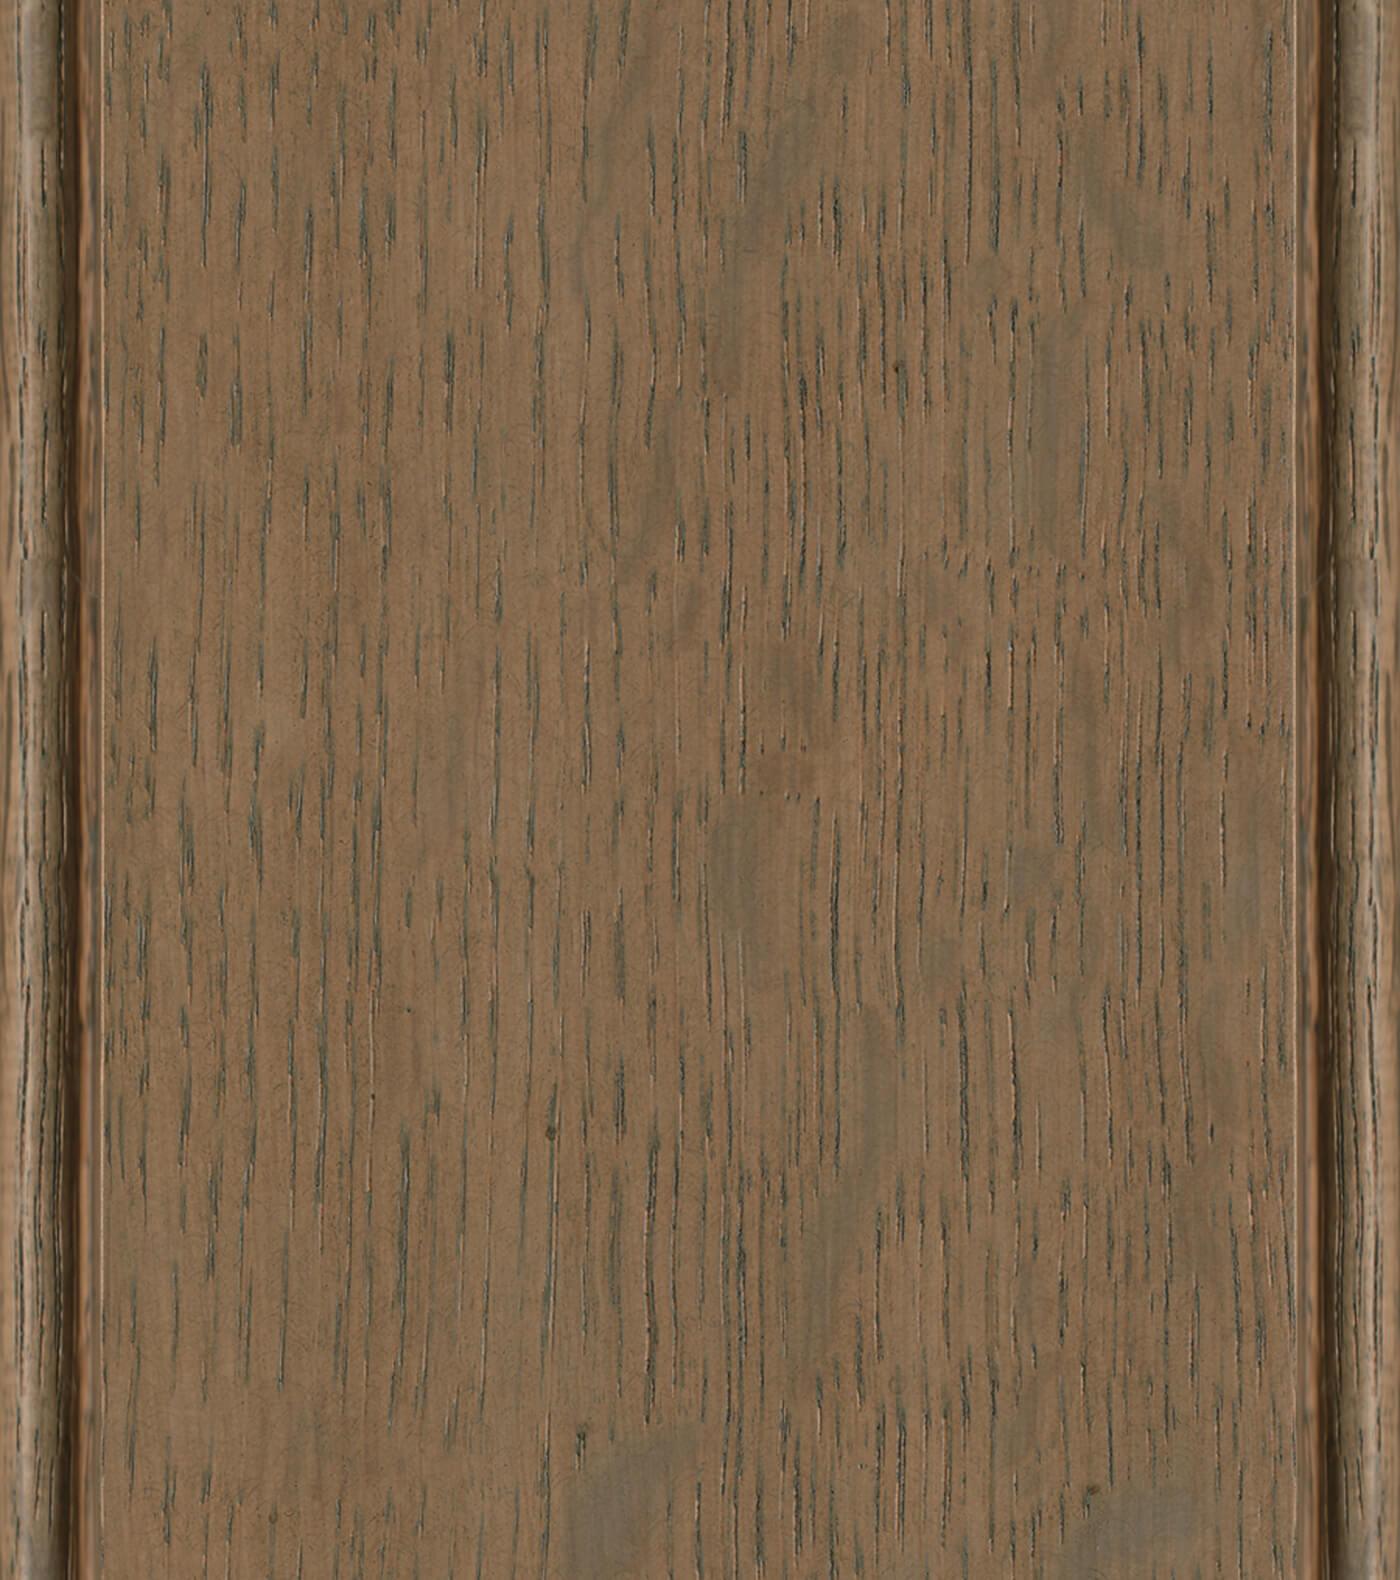 Cashew Stain on Red Oak or Quarter-Sawn Red Oak